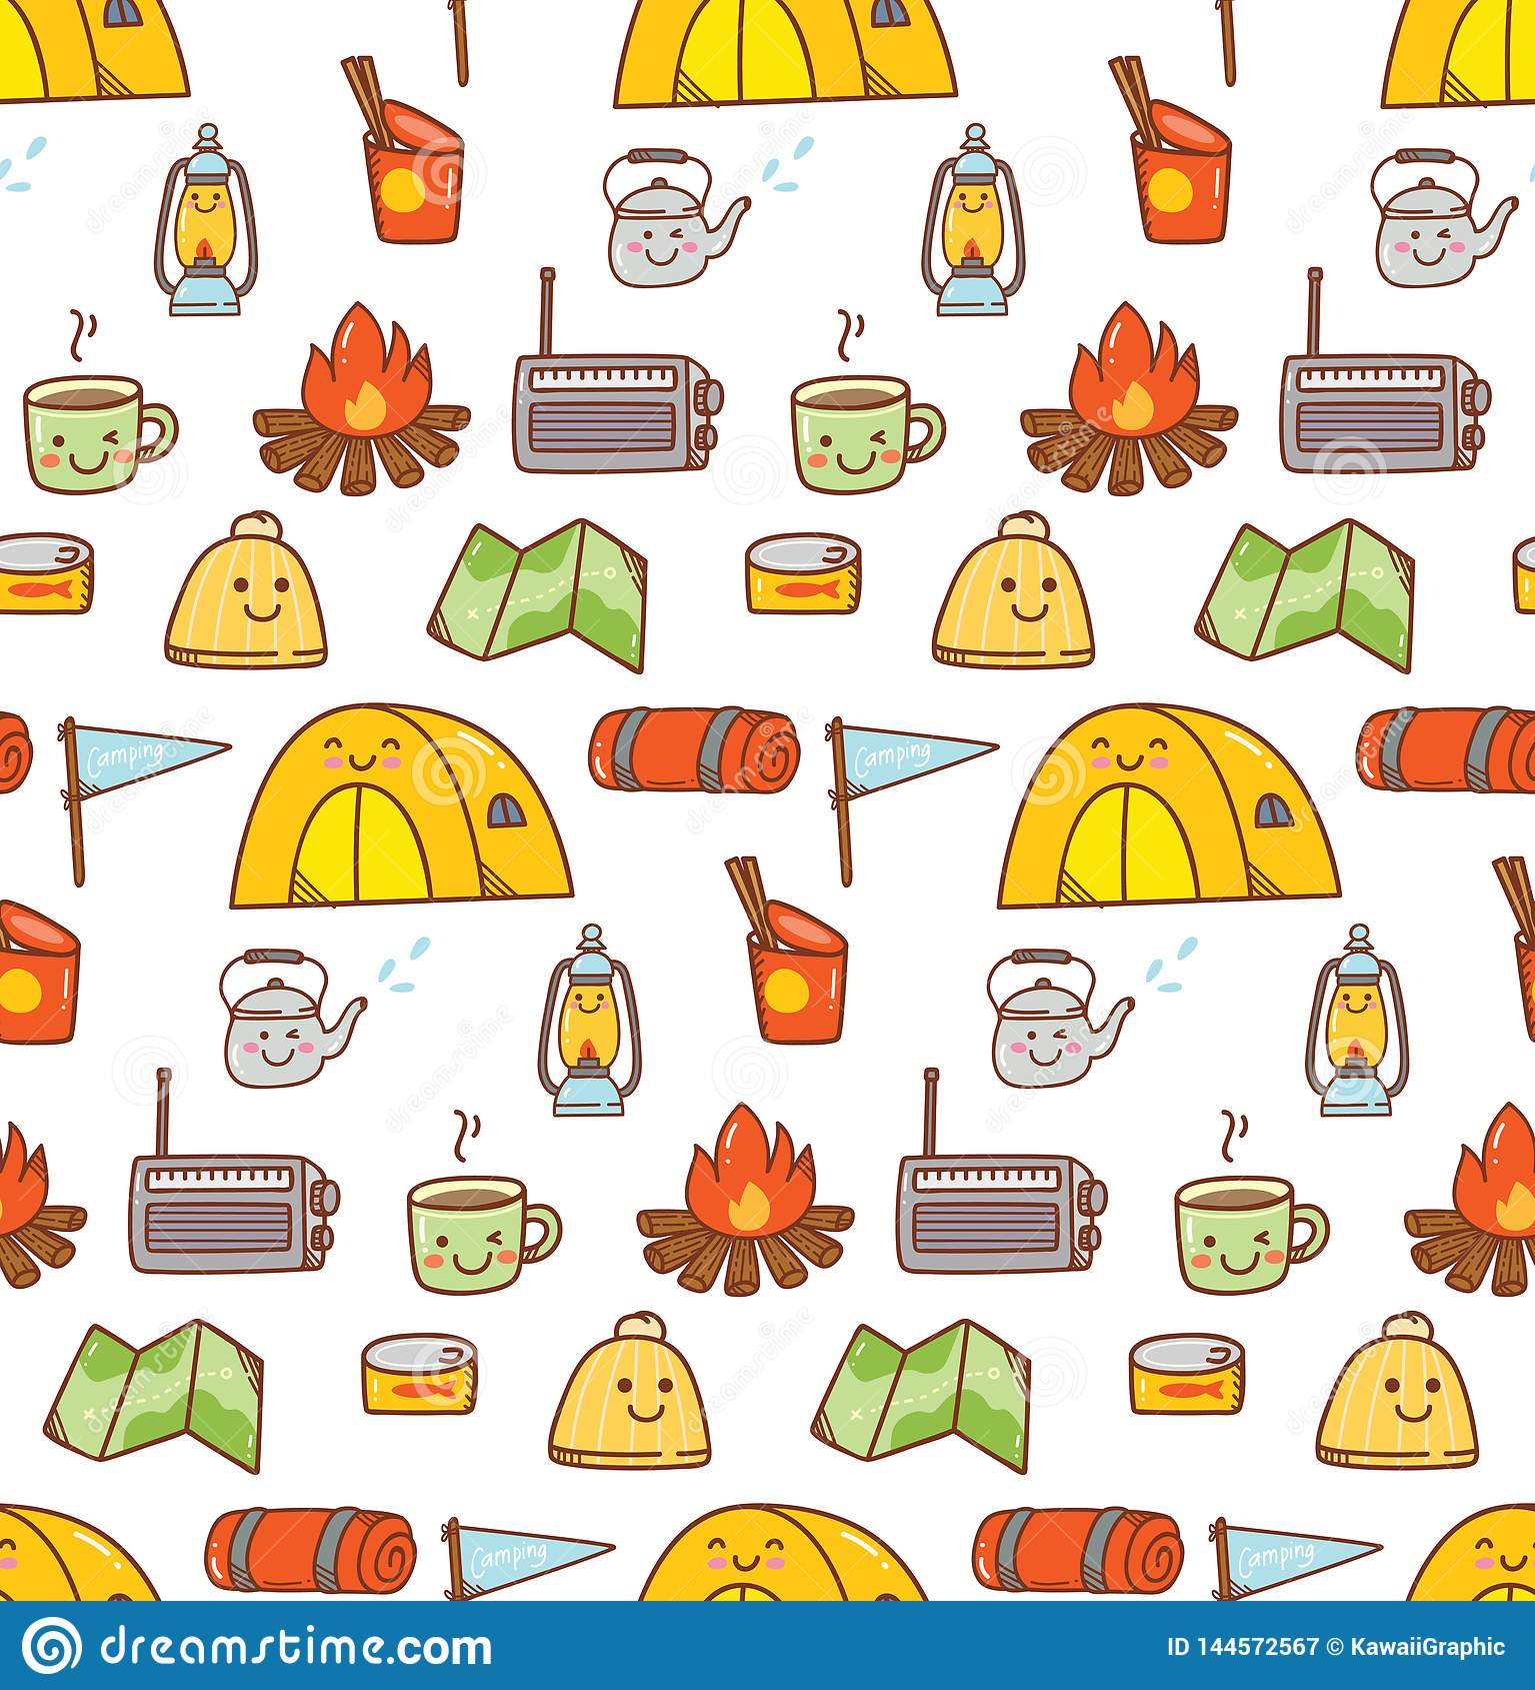 Camping Stuff Kawaii Doodle Seamless Background Stock Illustration Illustration Of Fabric Drawing 144572567